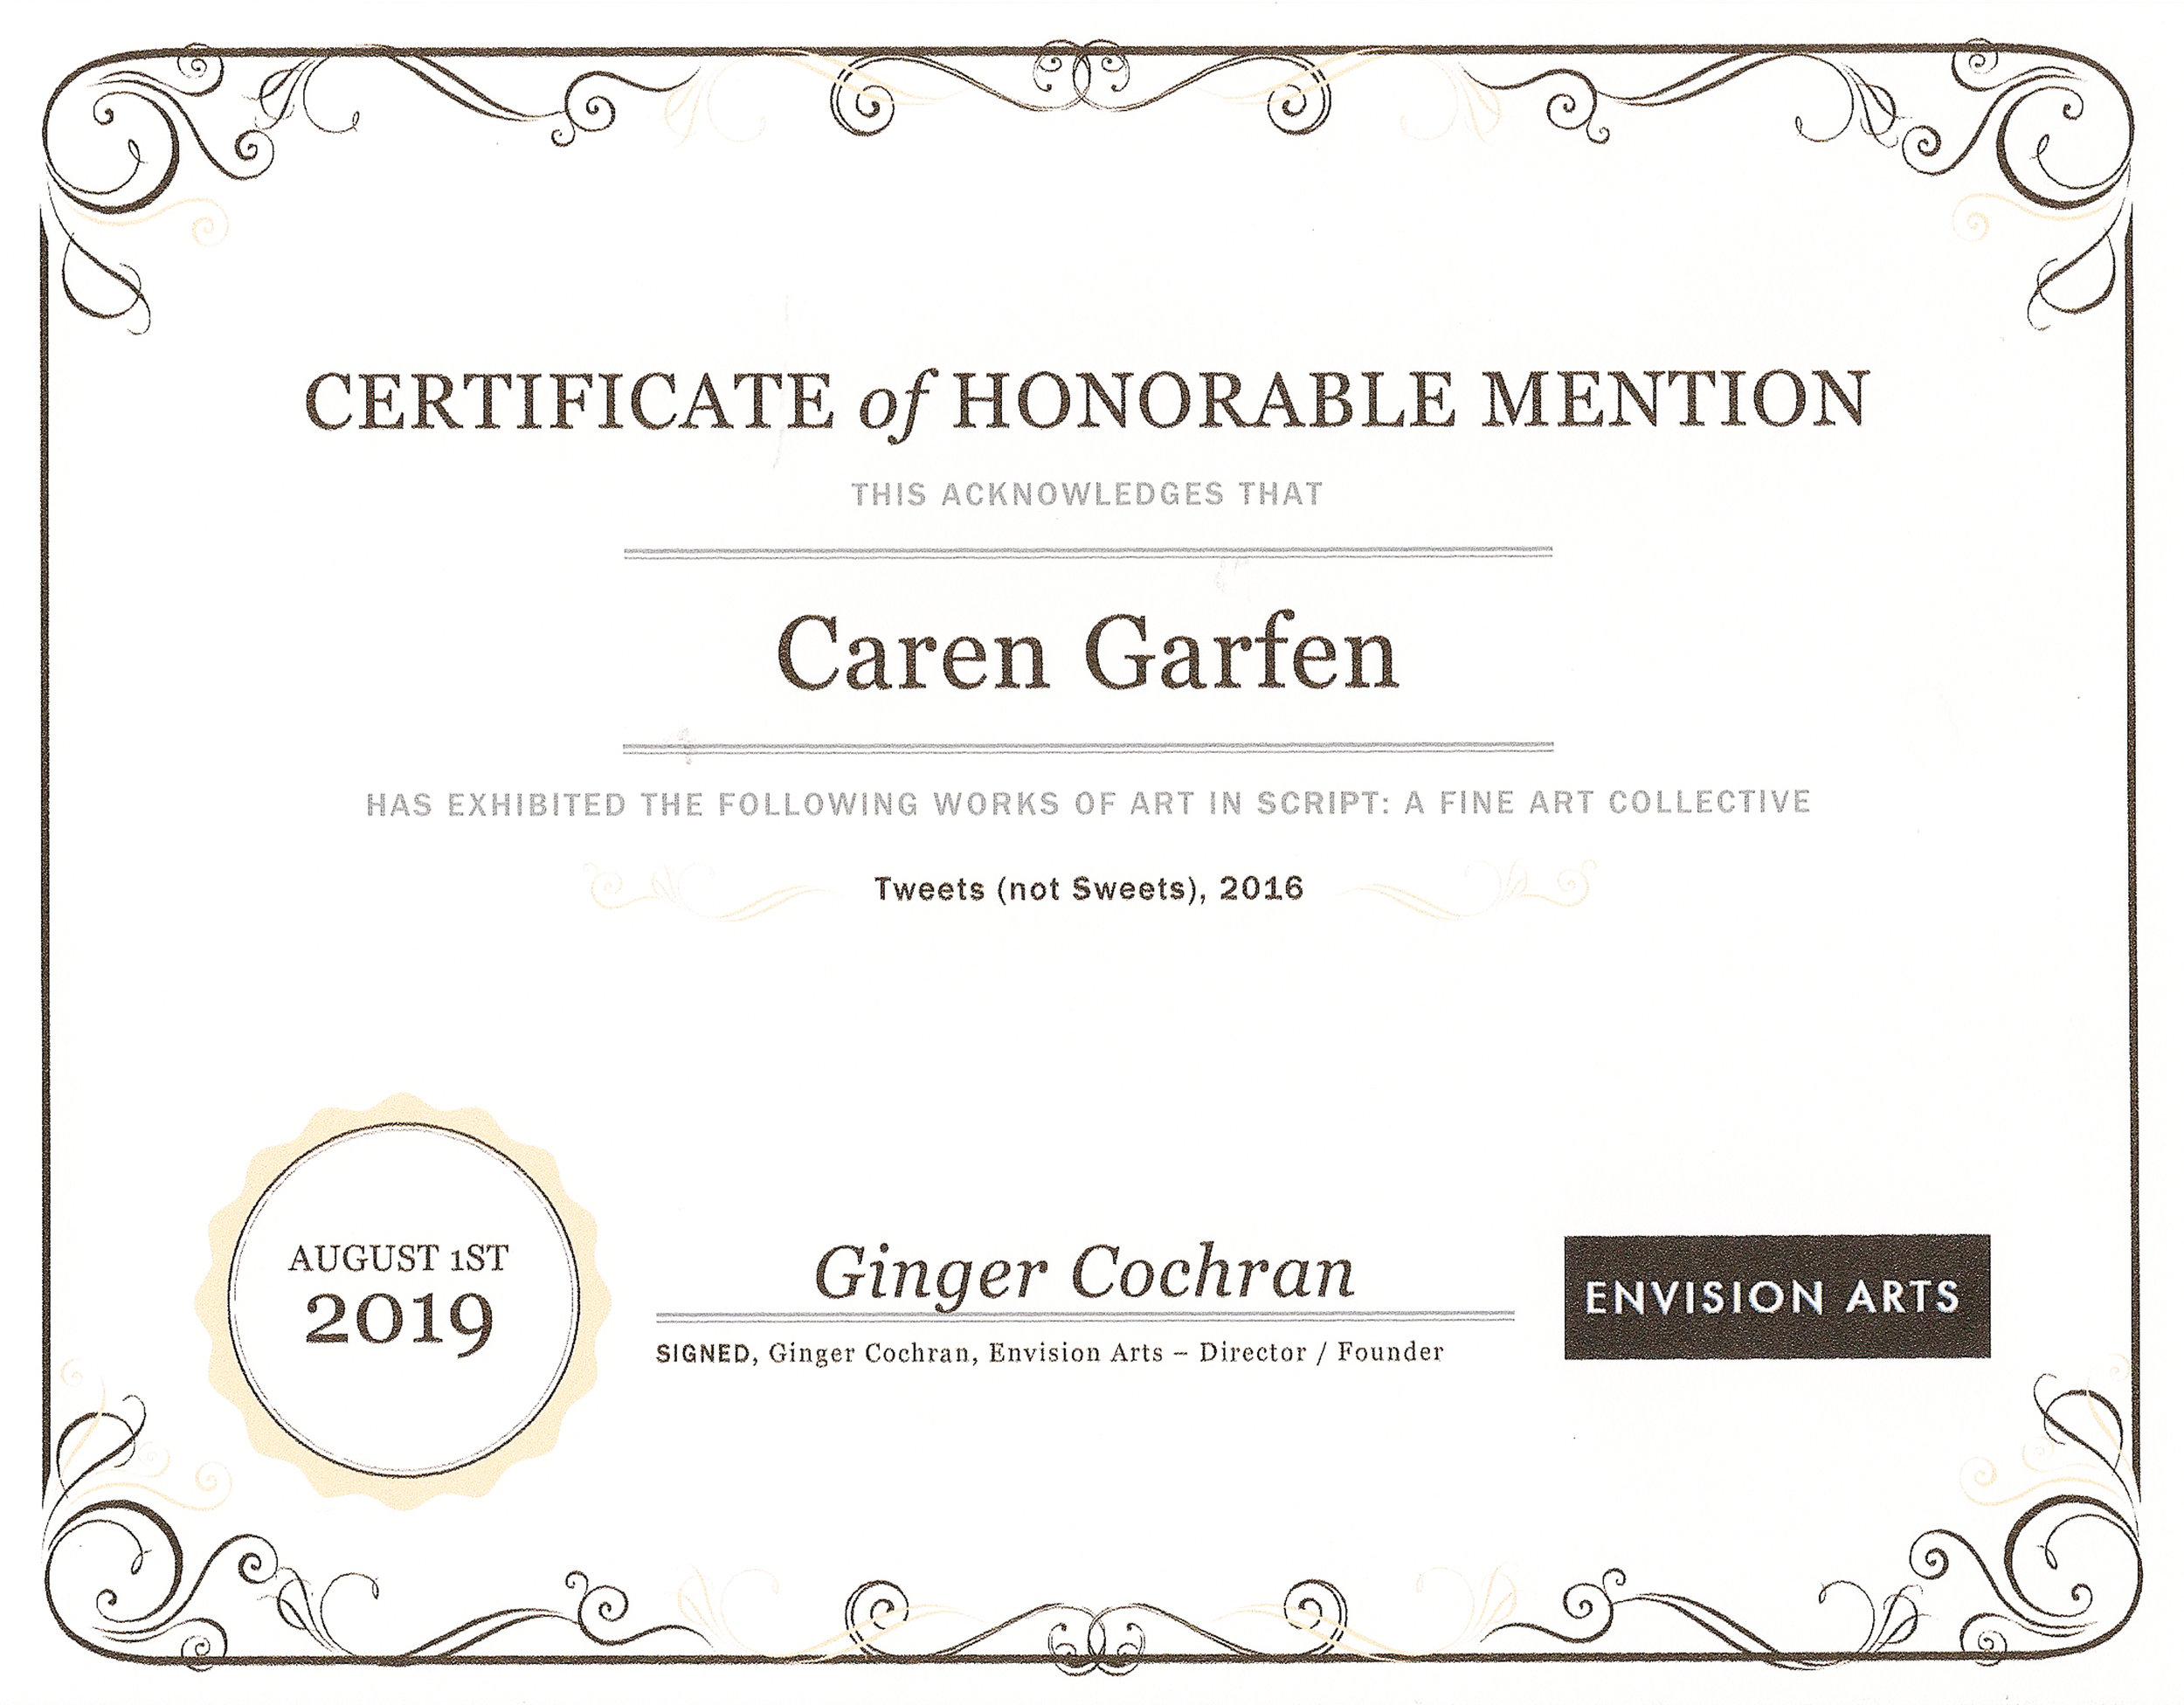 Awarded on 31 July 2019